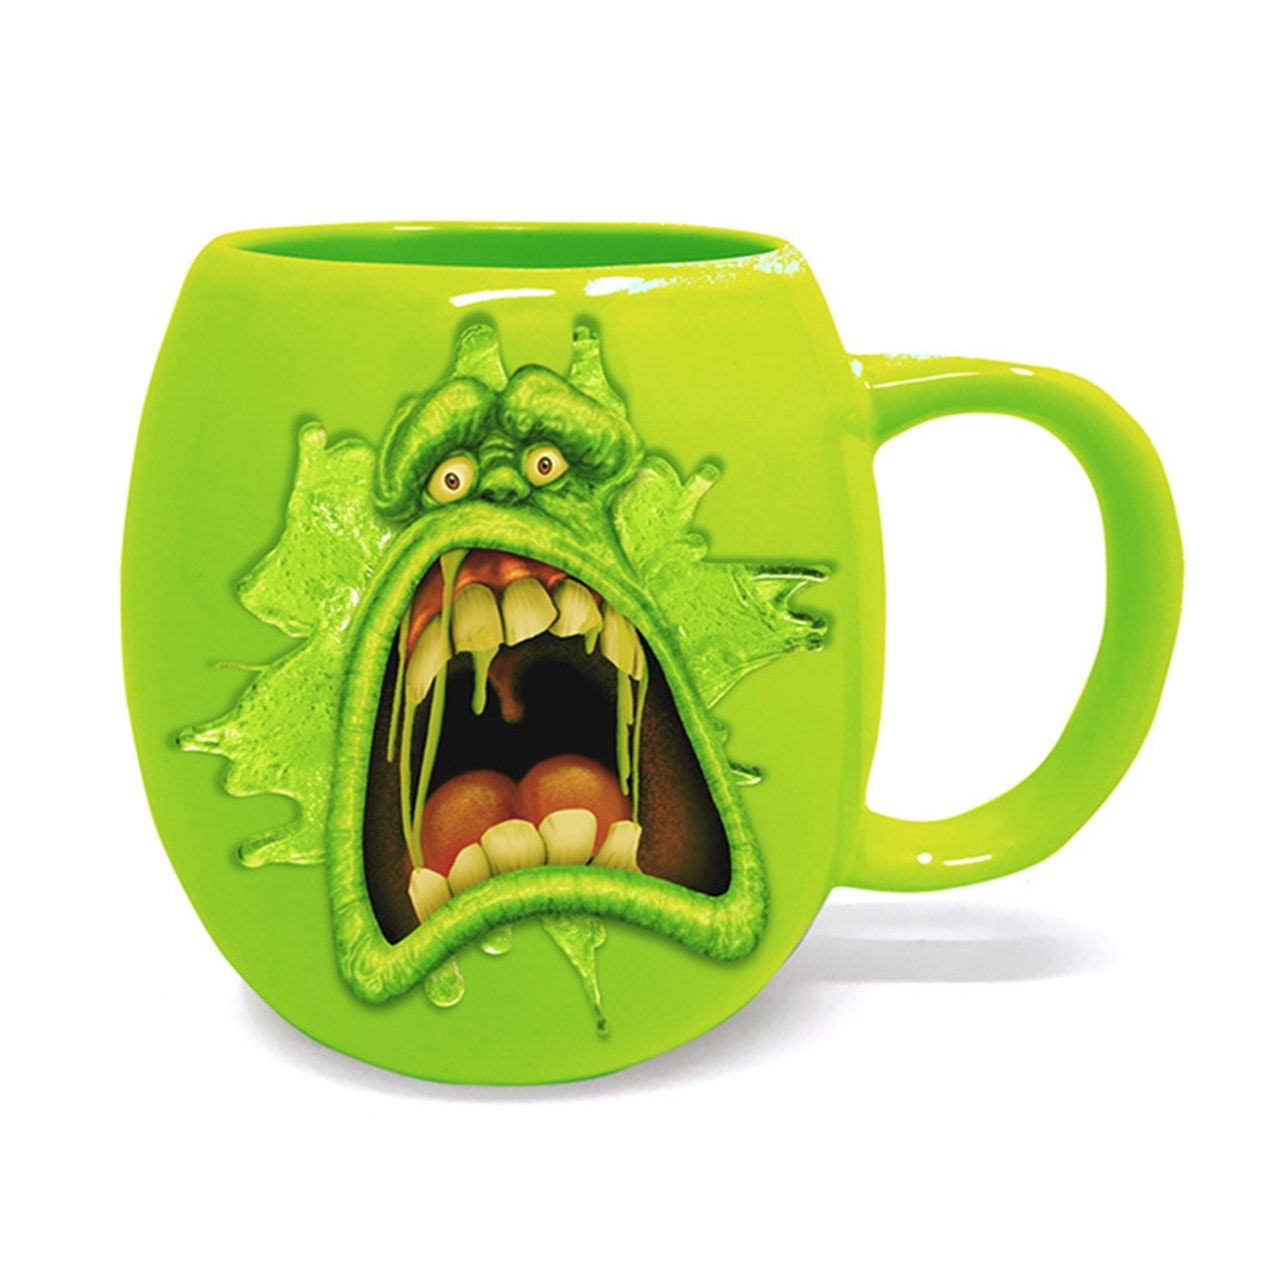 Ghostbusters: Slimer Mug - 1